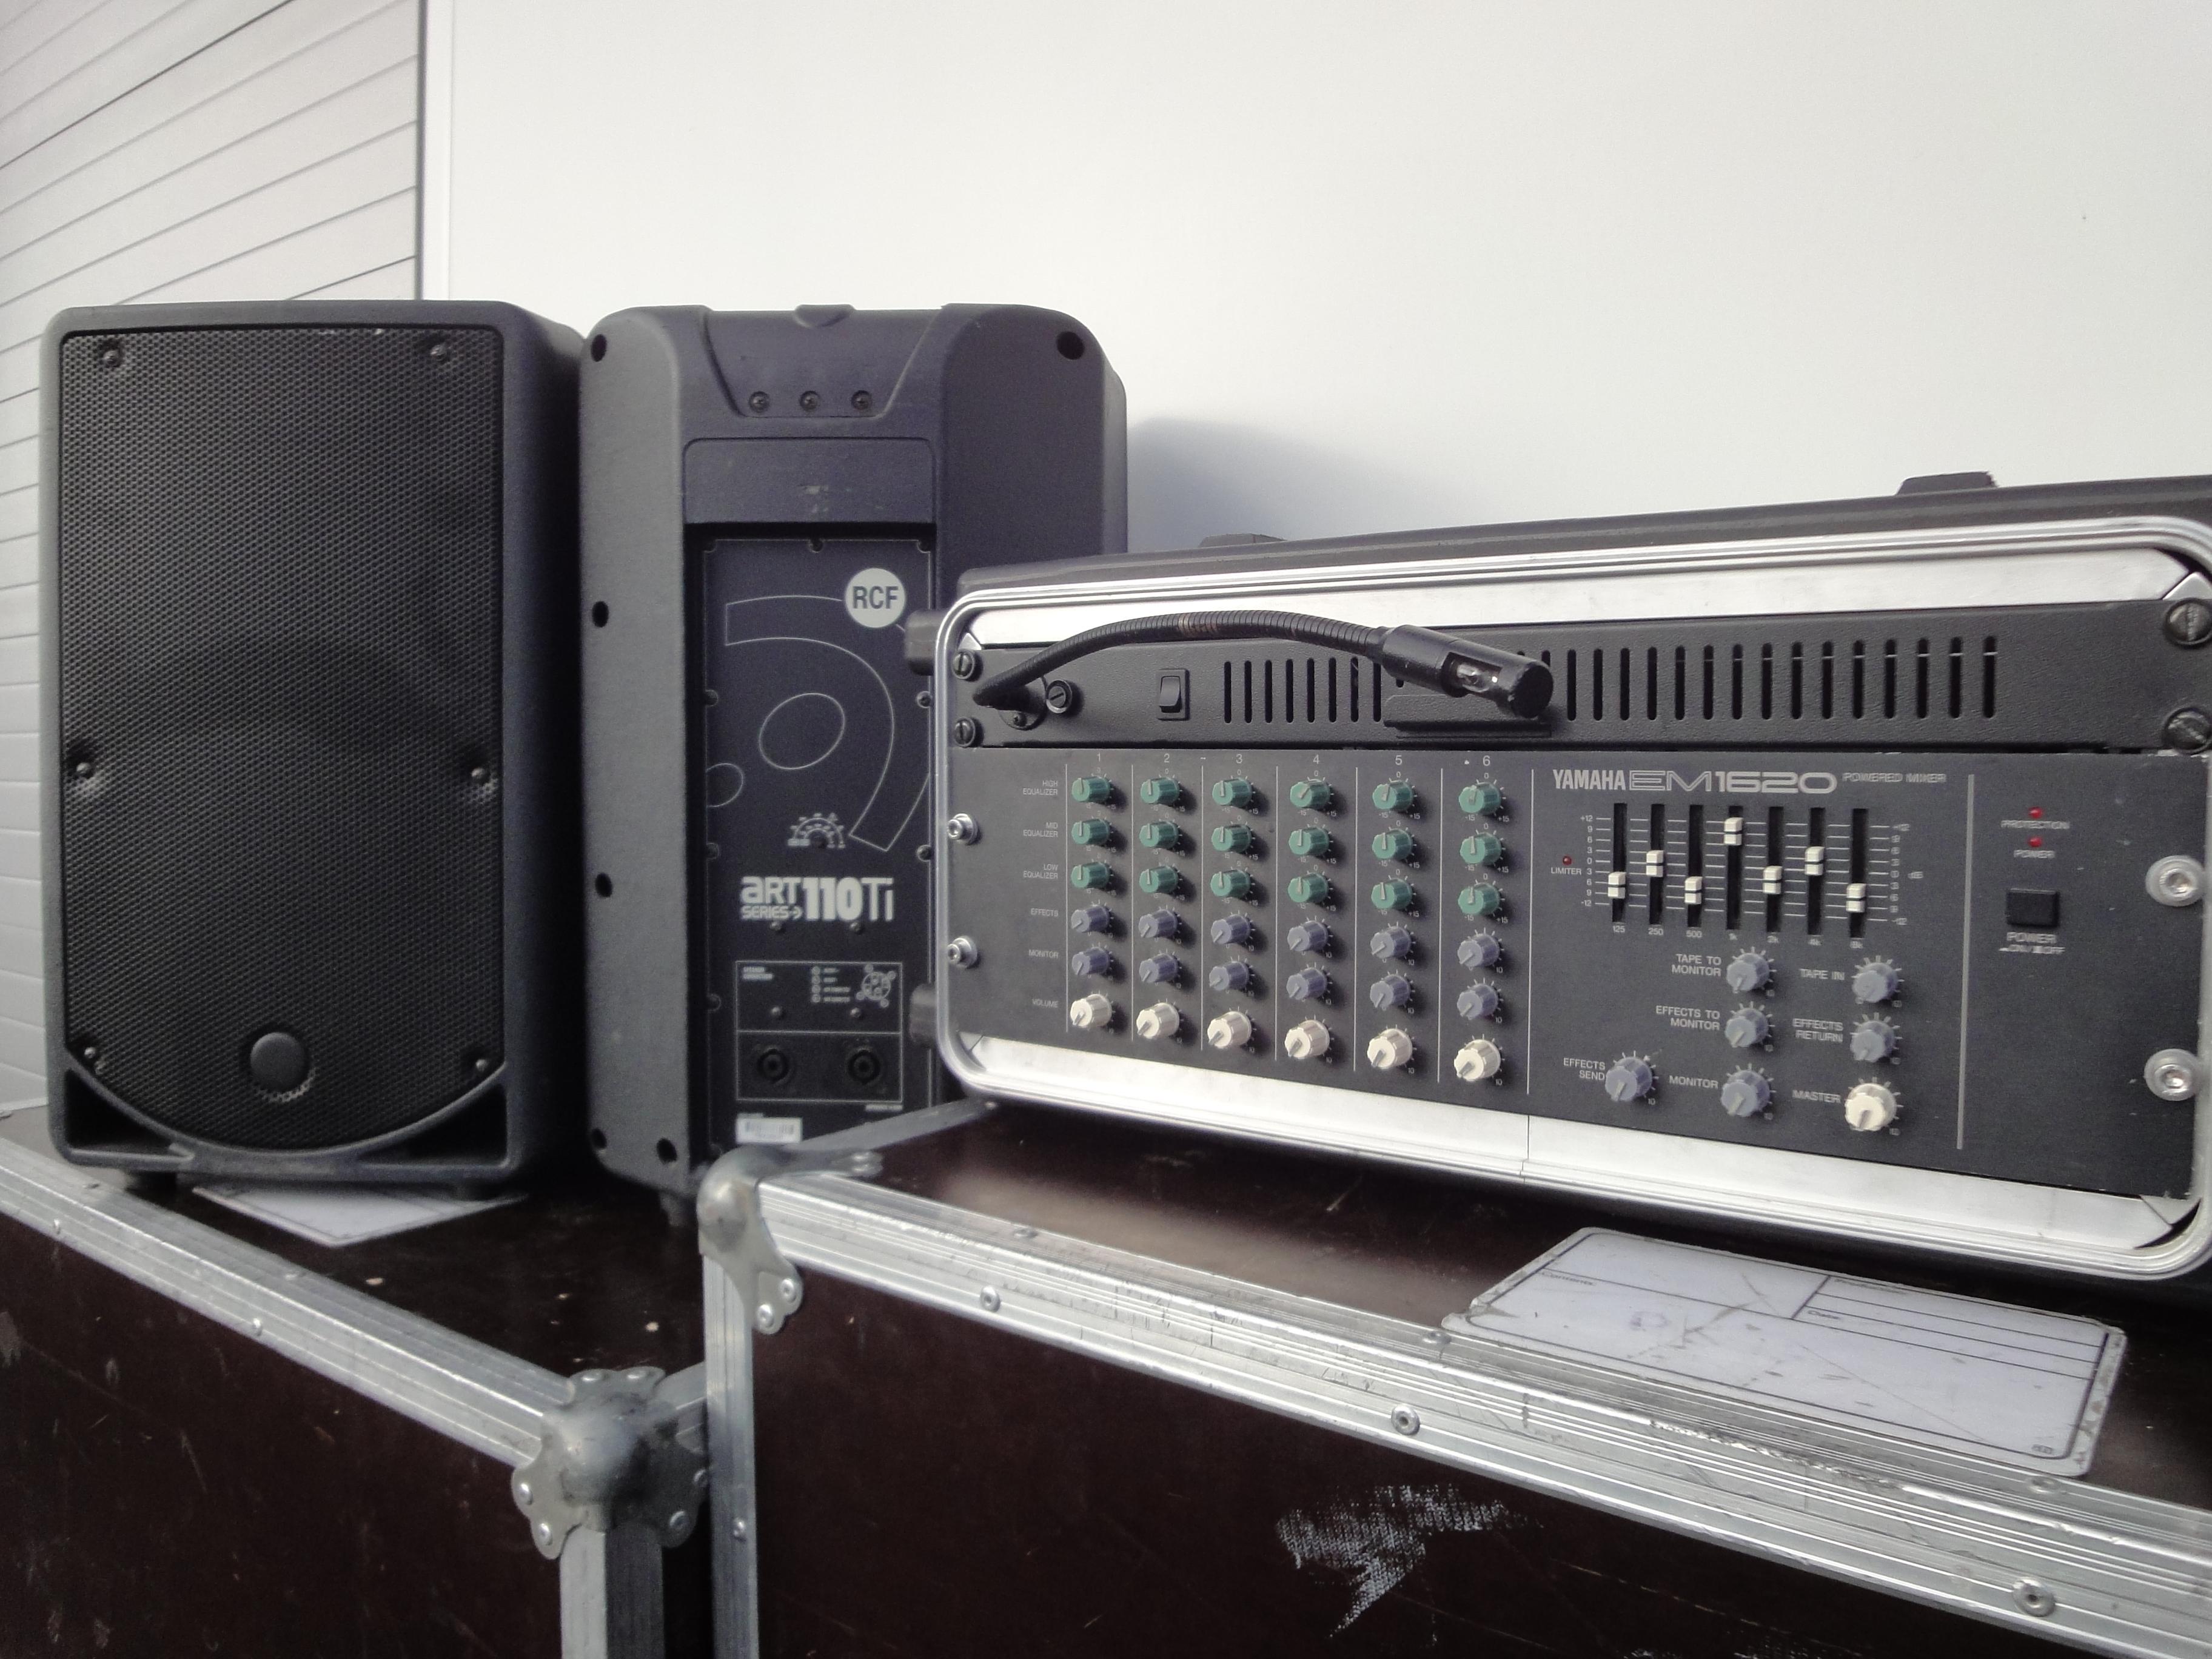 Console de mixage amplifiee yamaha em 1620 2 enceintes de sonorisation rcf art 110 ti 2 - Console de mixage amplifiee ...